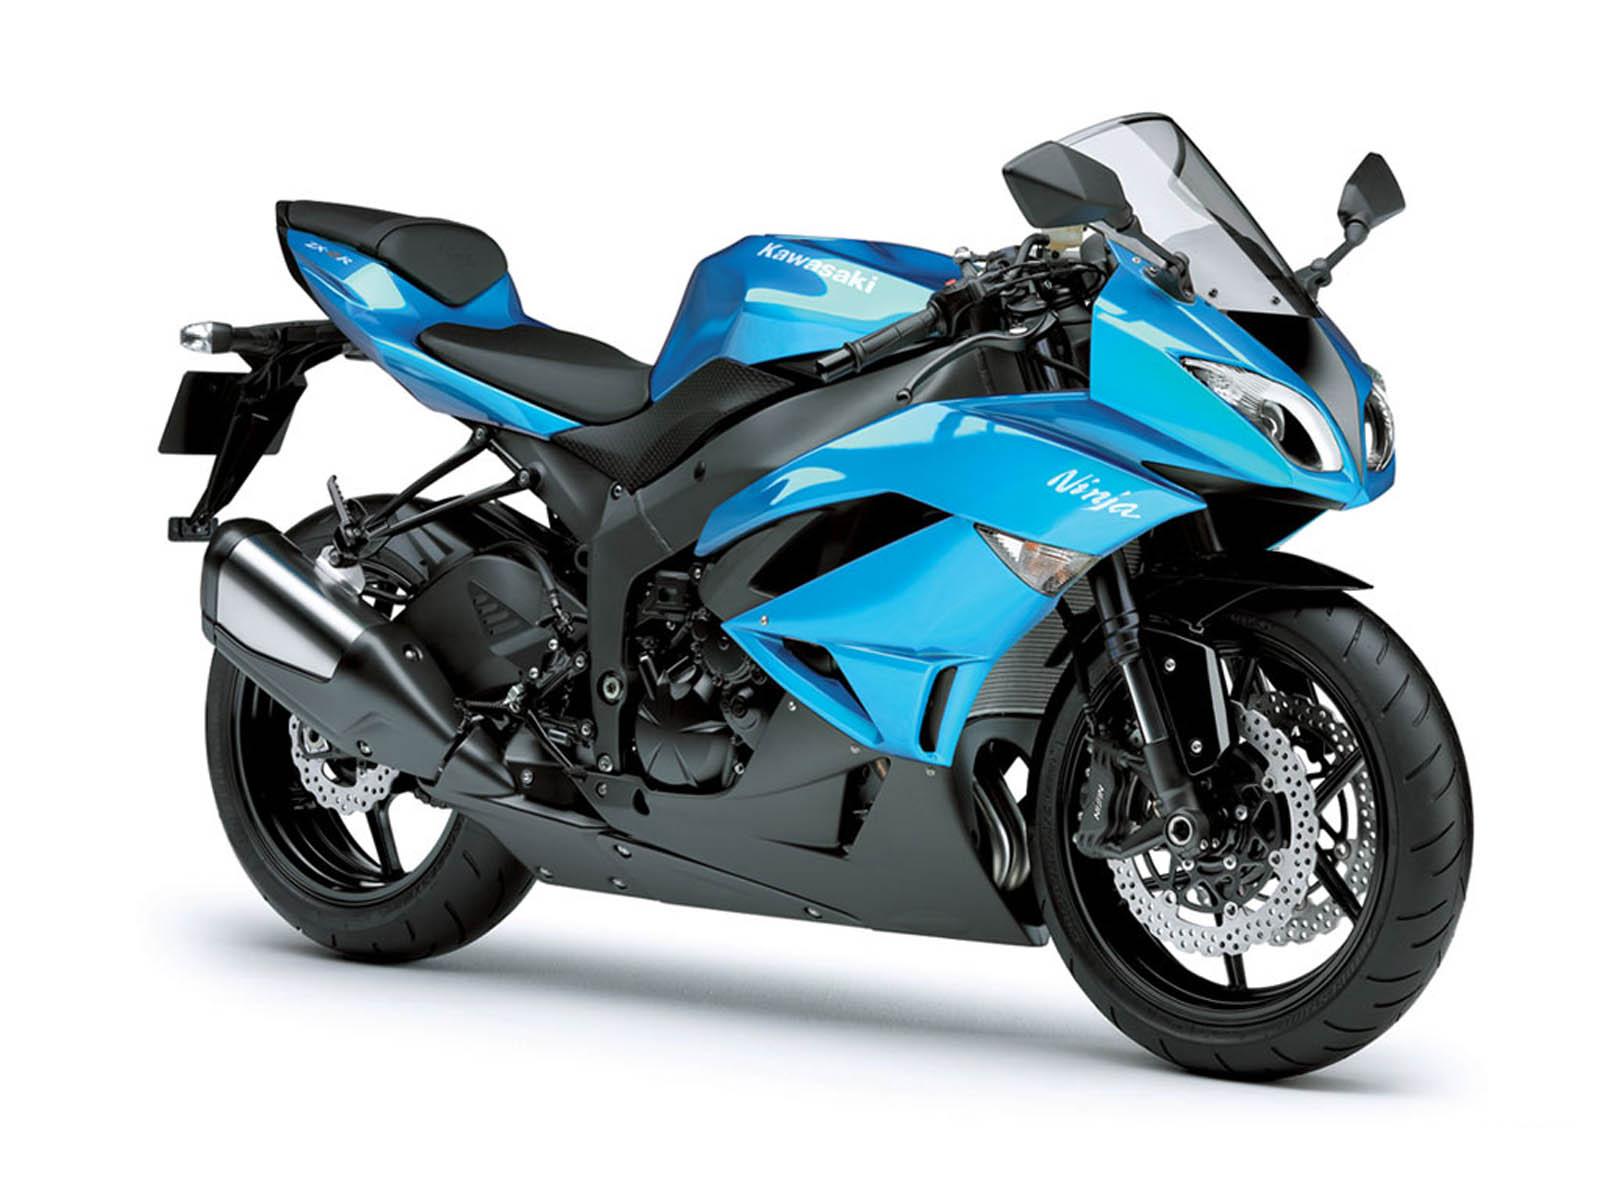 Wallpapers: Kawasaki Ninja ZX 6R Bike